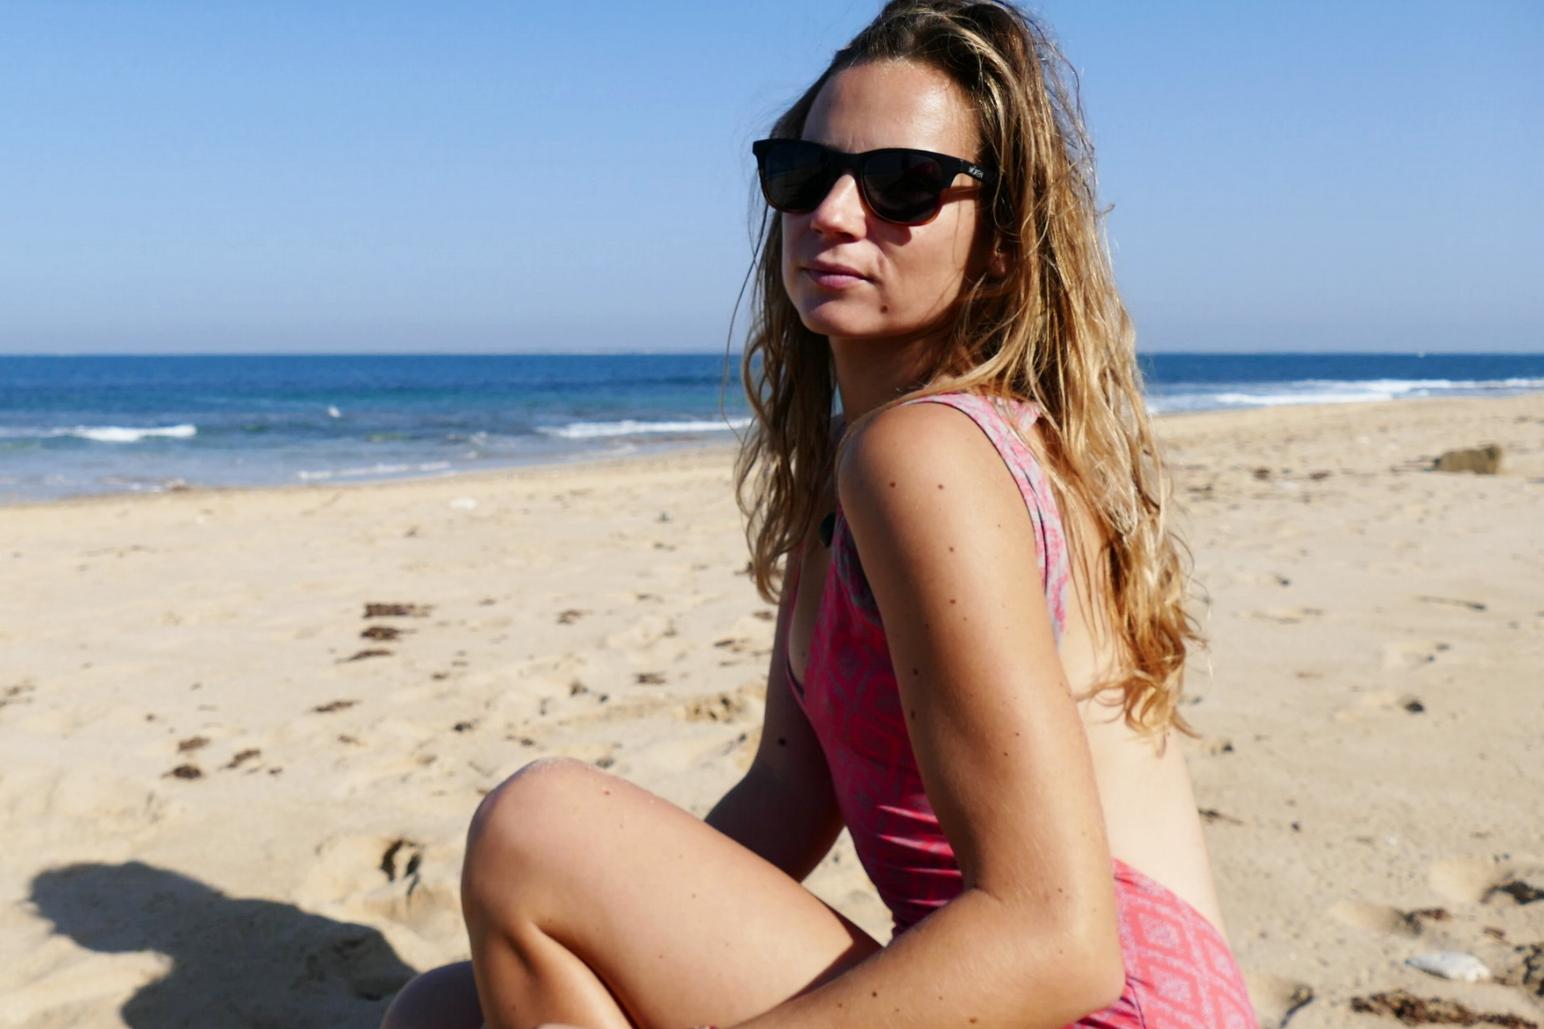 Endless Summer on Ile de Re